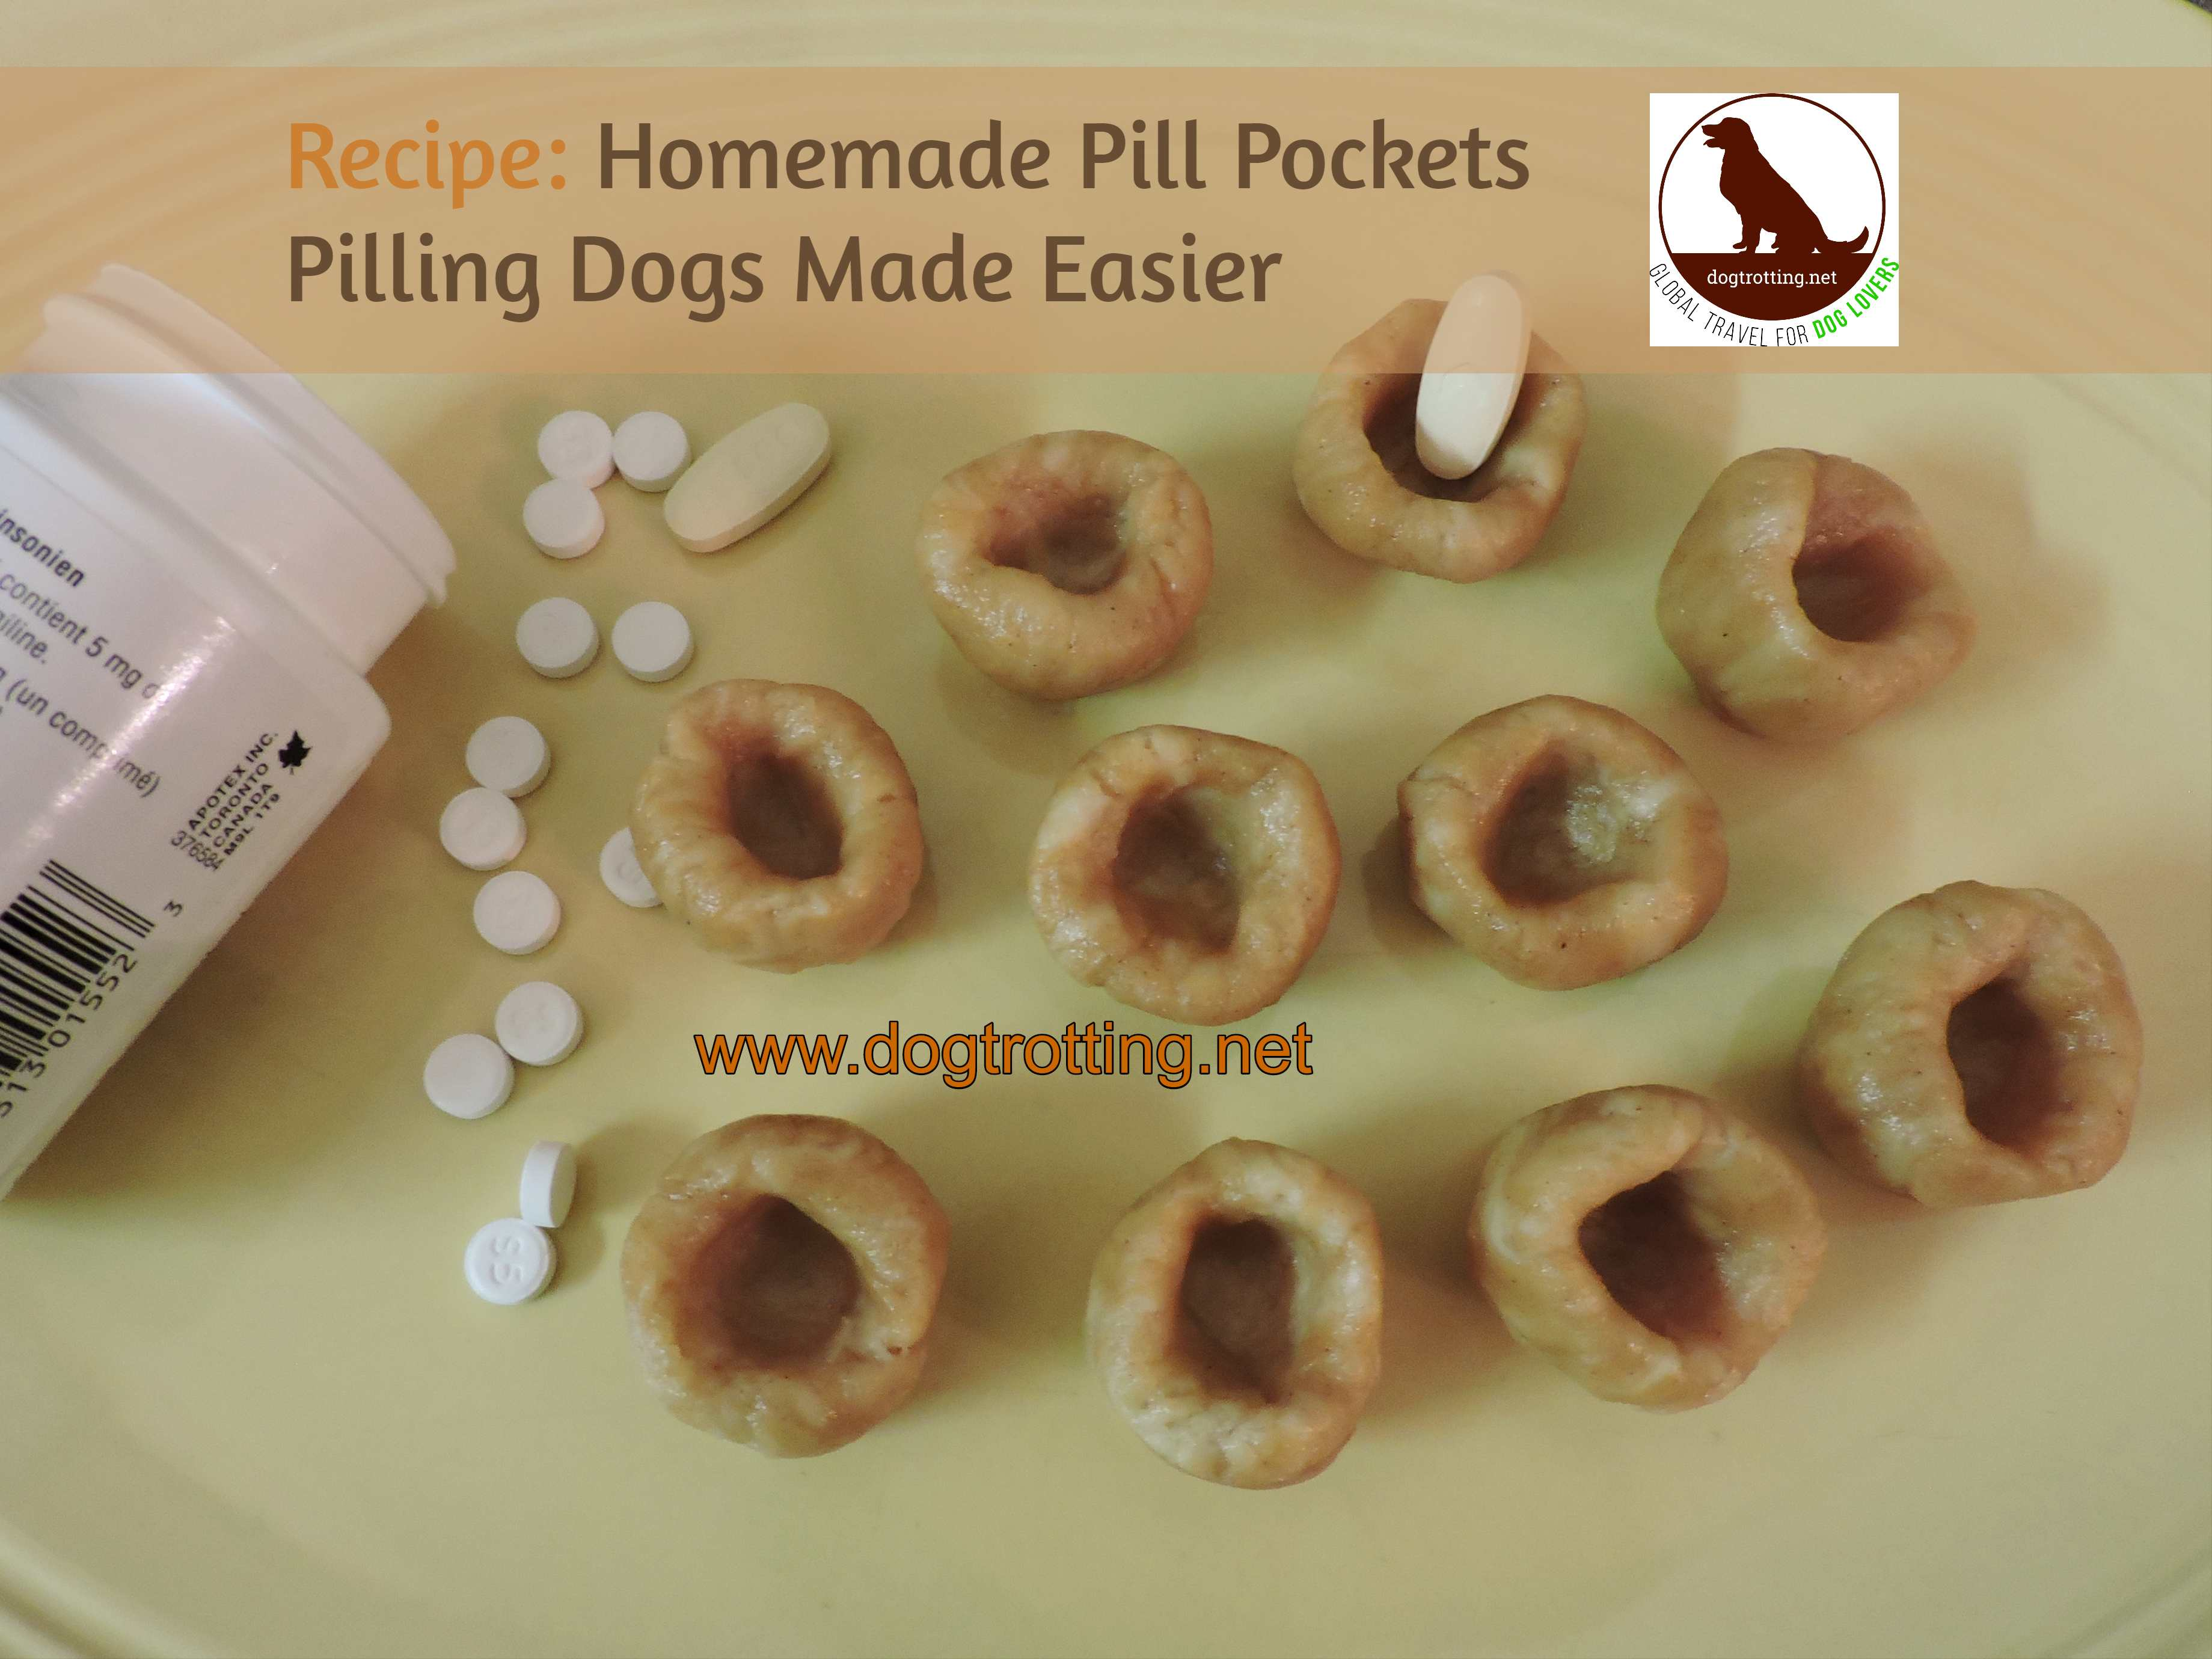 Homemade pill pockets for dogs